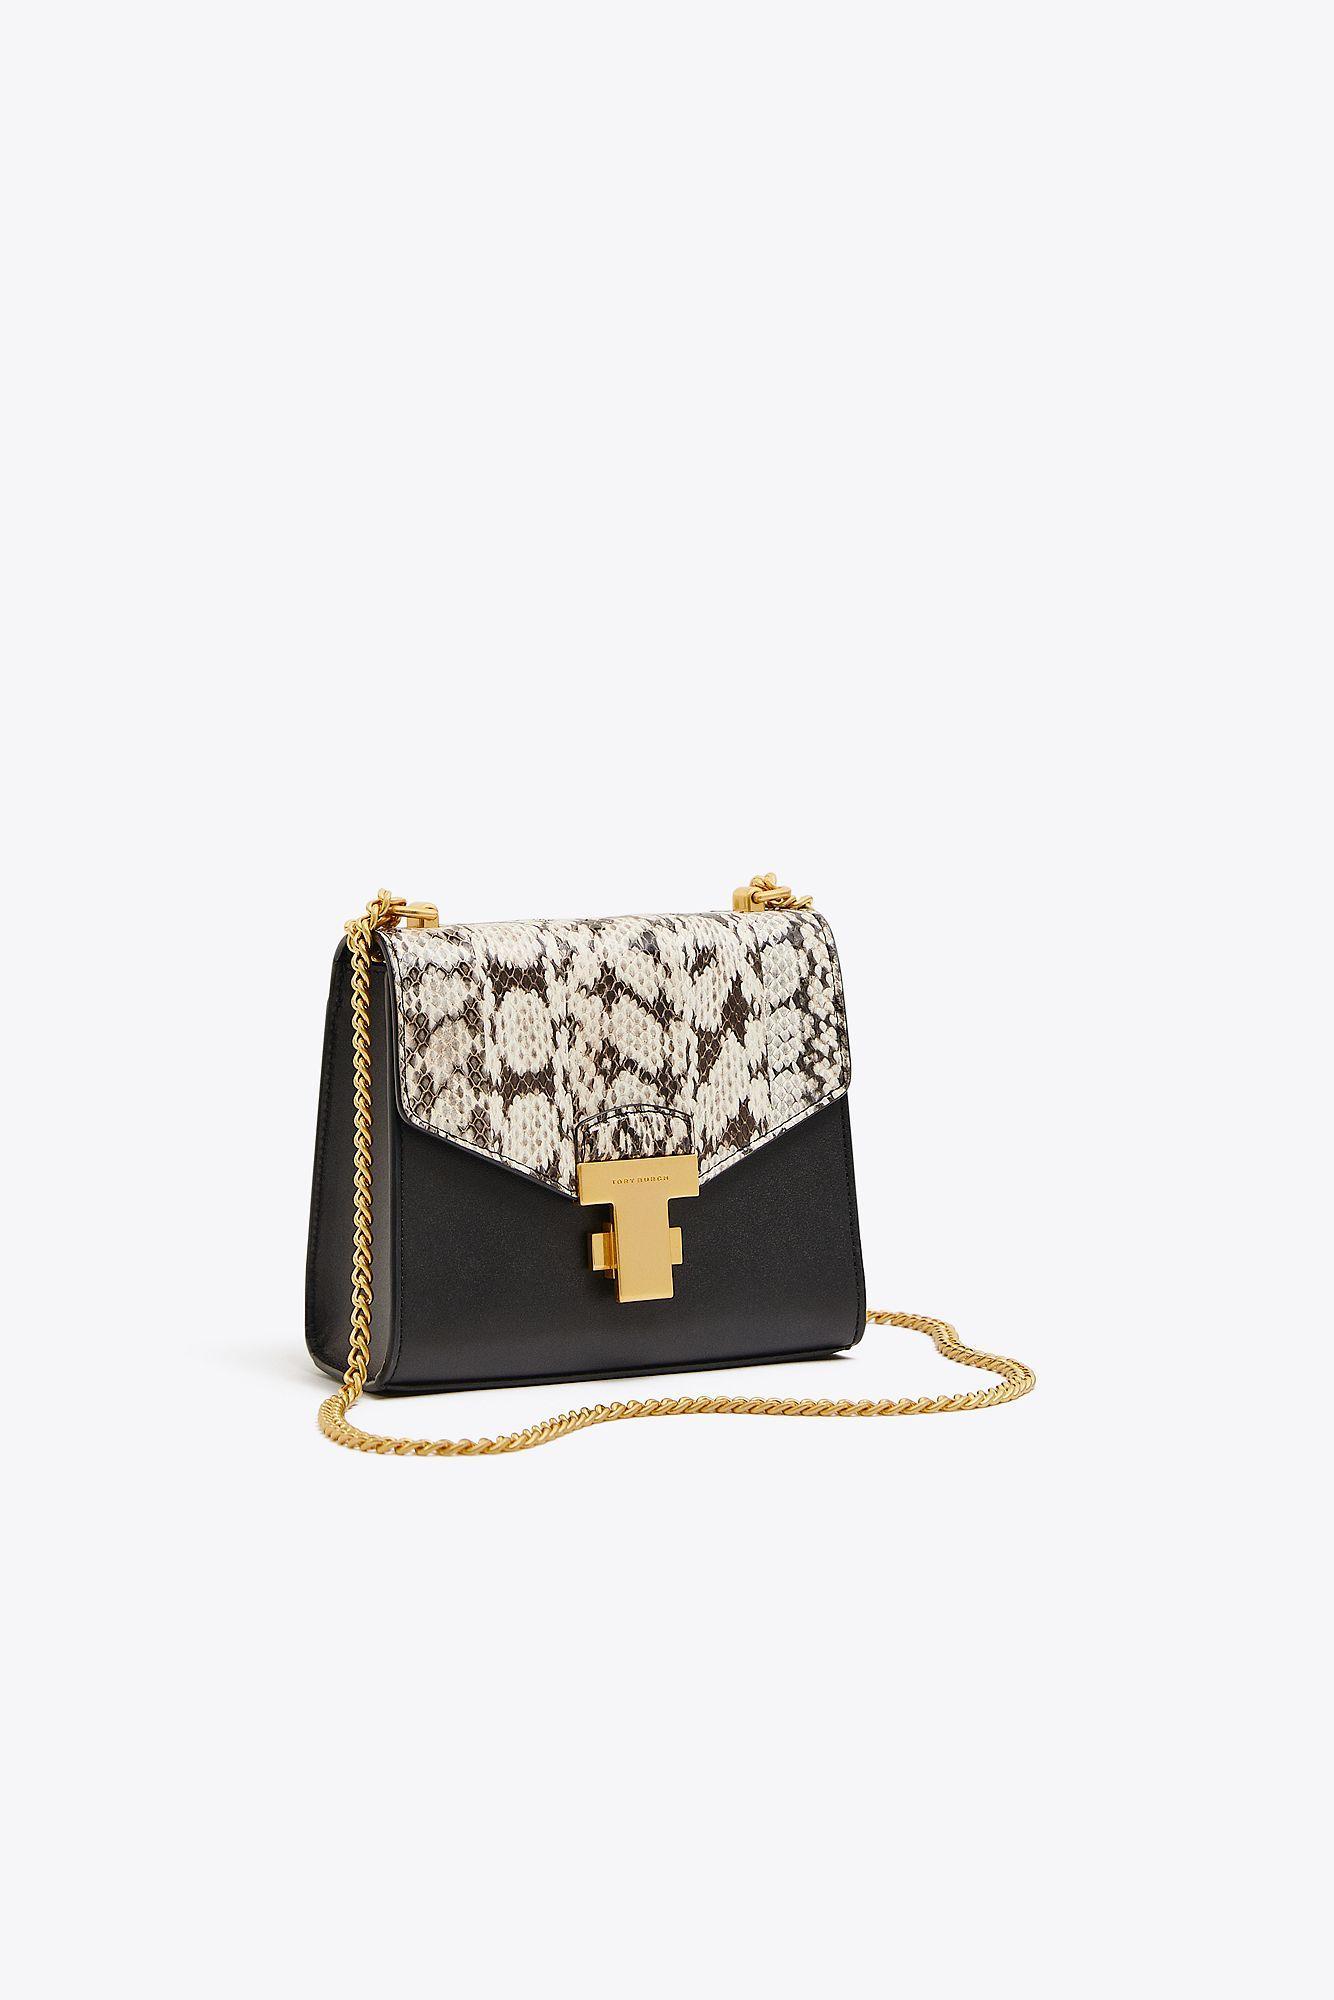 7269db1fb0e7e Tory Burch. Women s Black Juliette Exotic Chain Mini Bag ...